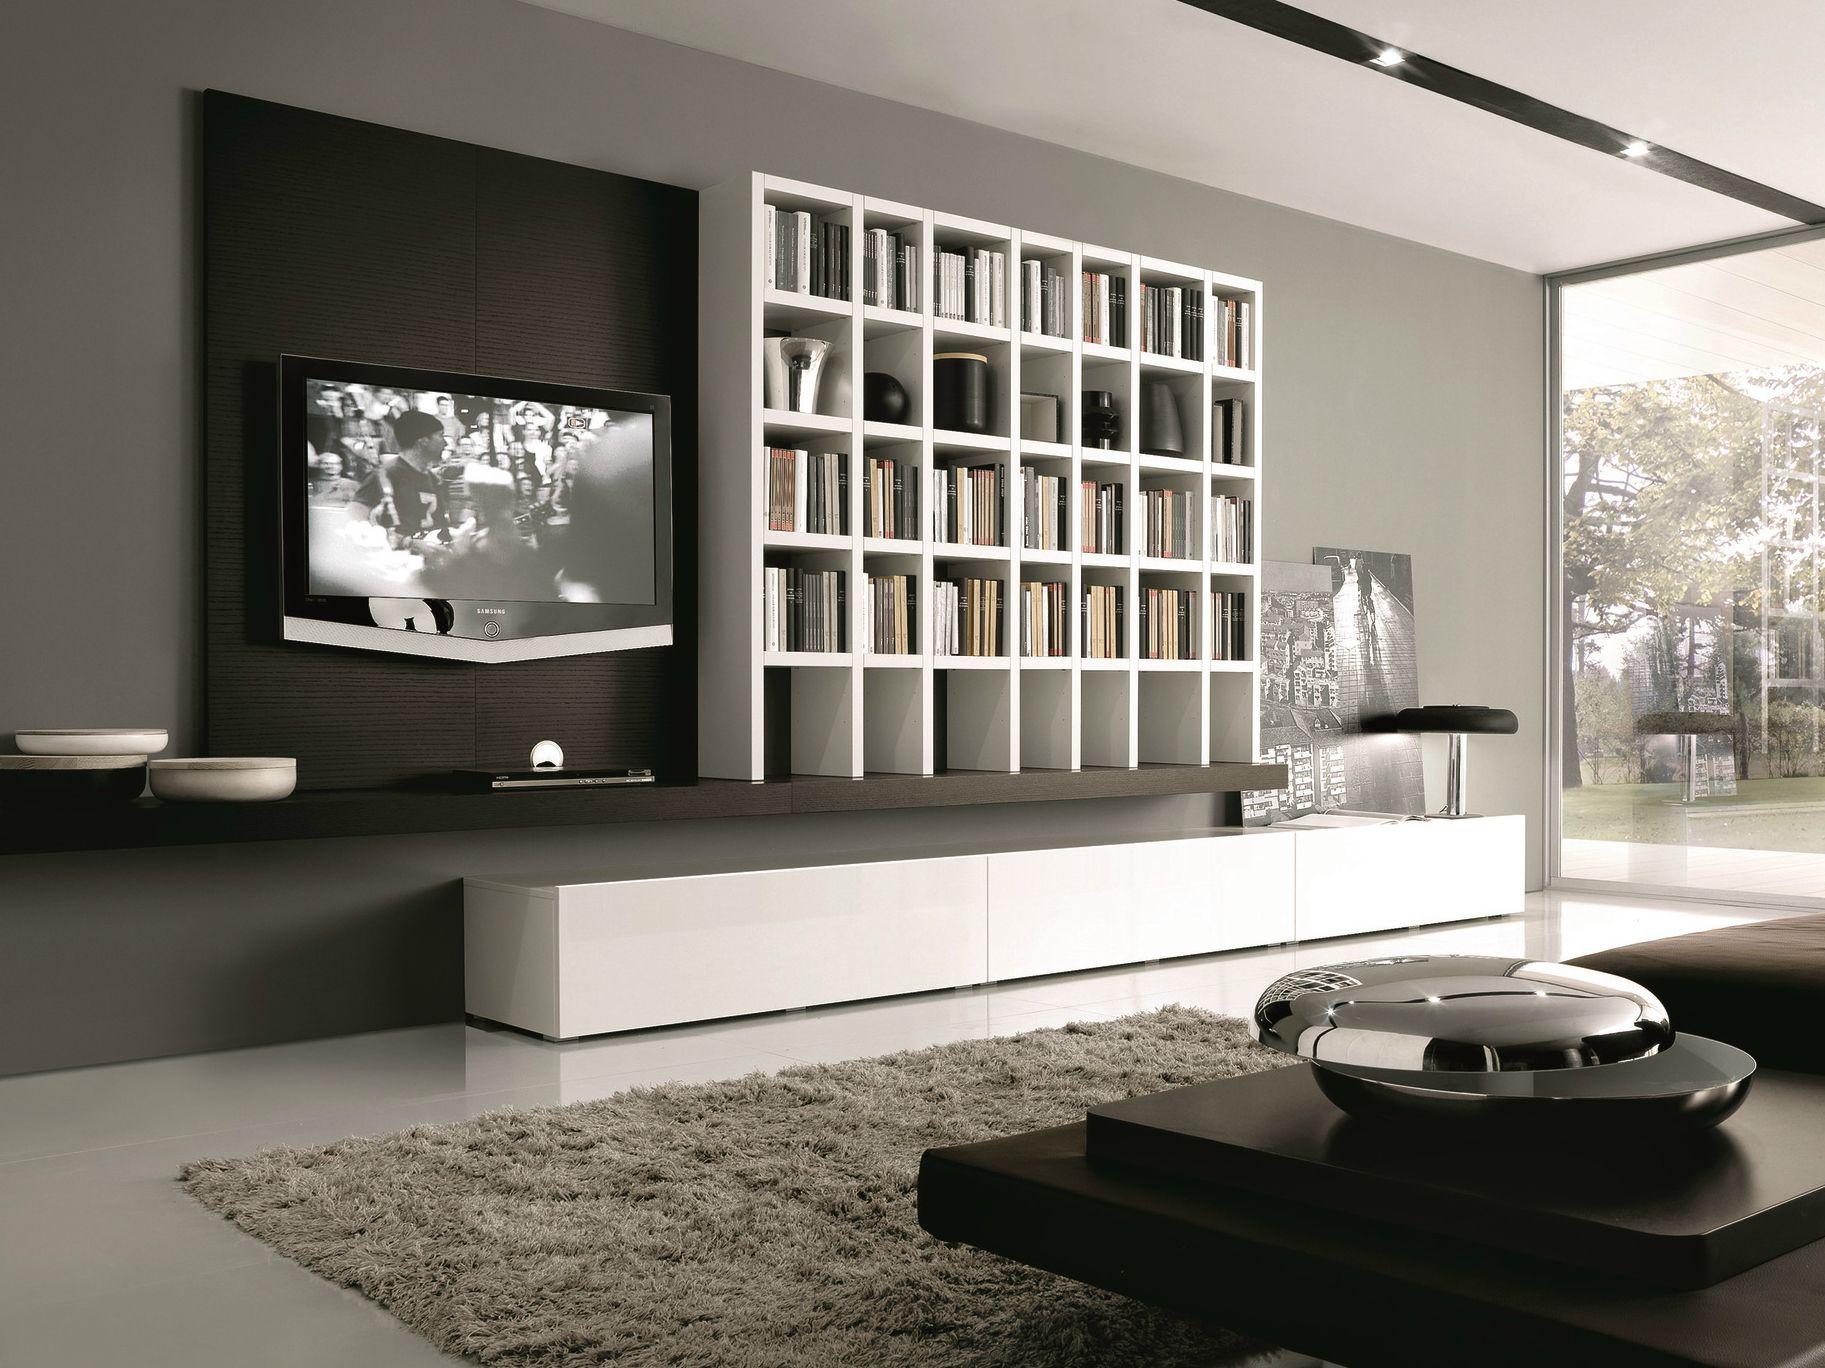 Mueble modular de pared composable lacado de madera - Lacado de madera ...